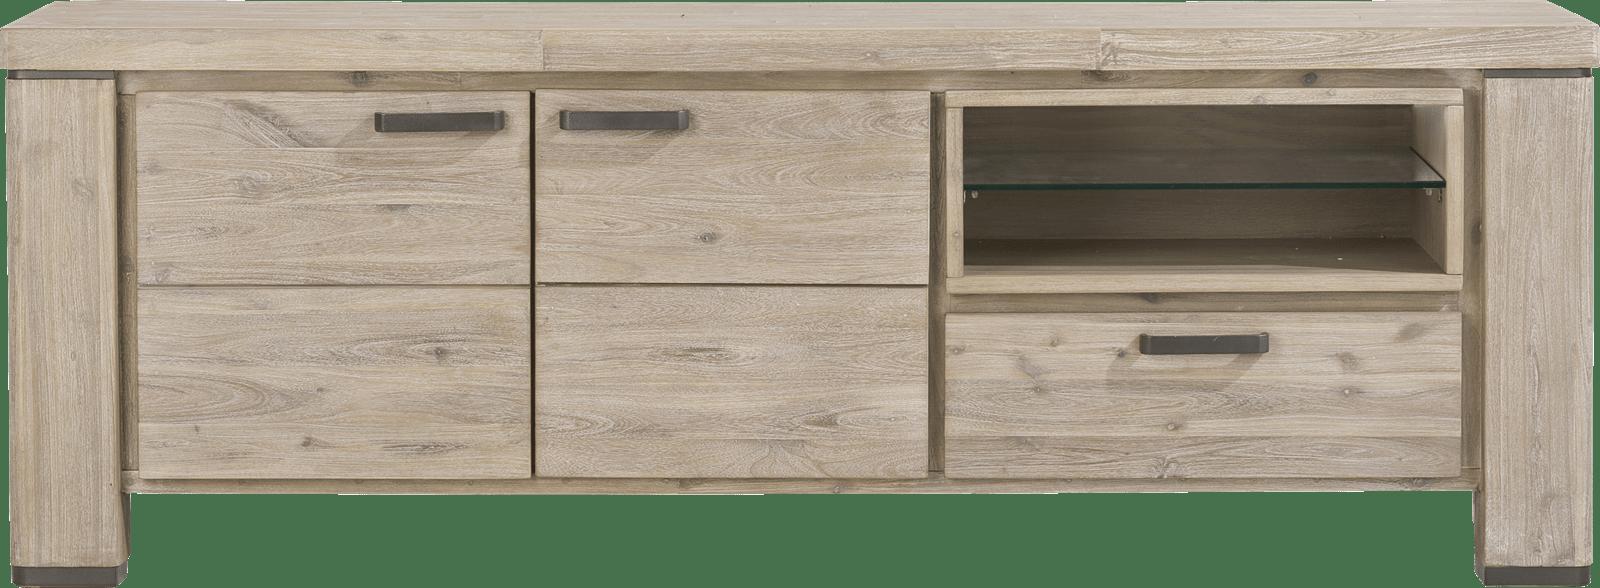 Coiba - lowboard 170 cm - 2-deuren + 1-lade + 2-niches